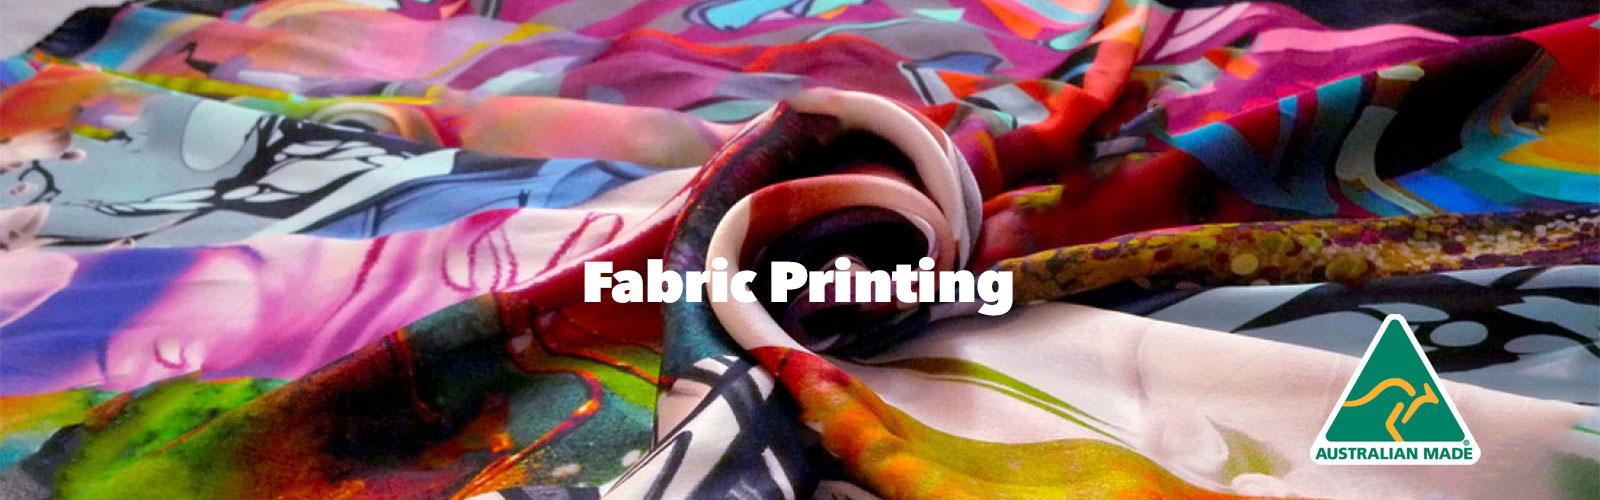 Fabric Printing @ Image Digital